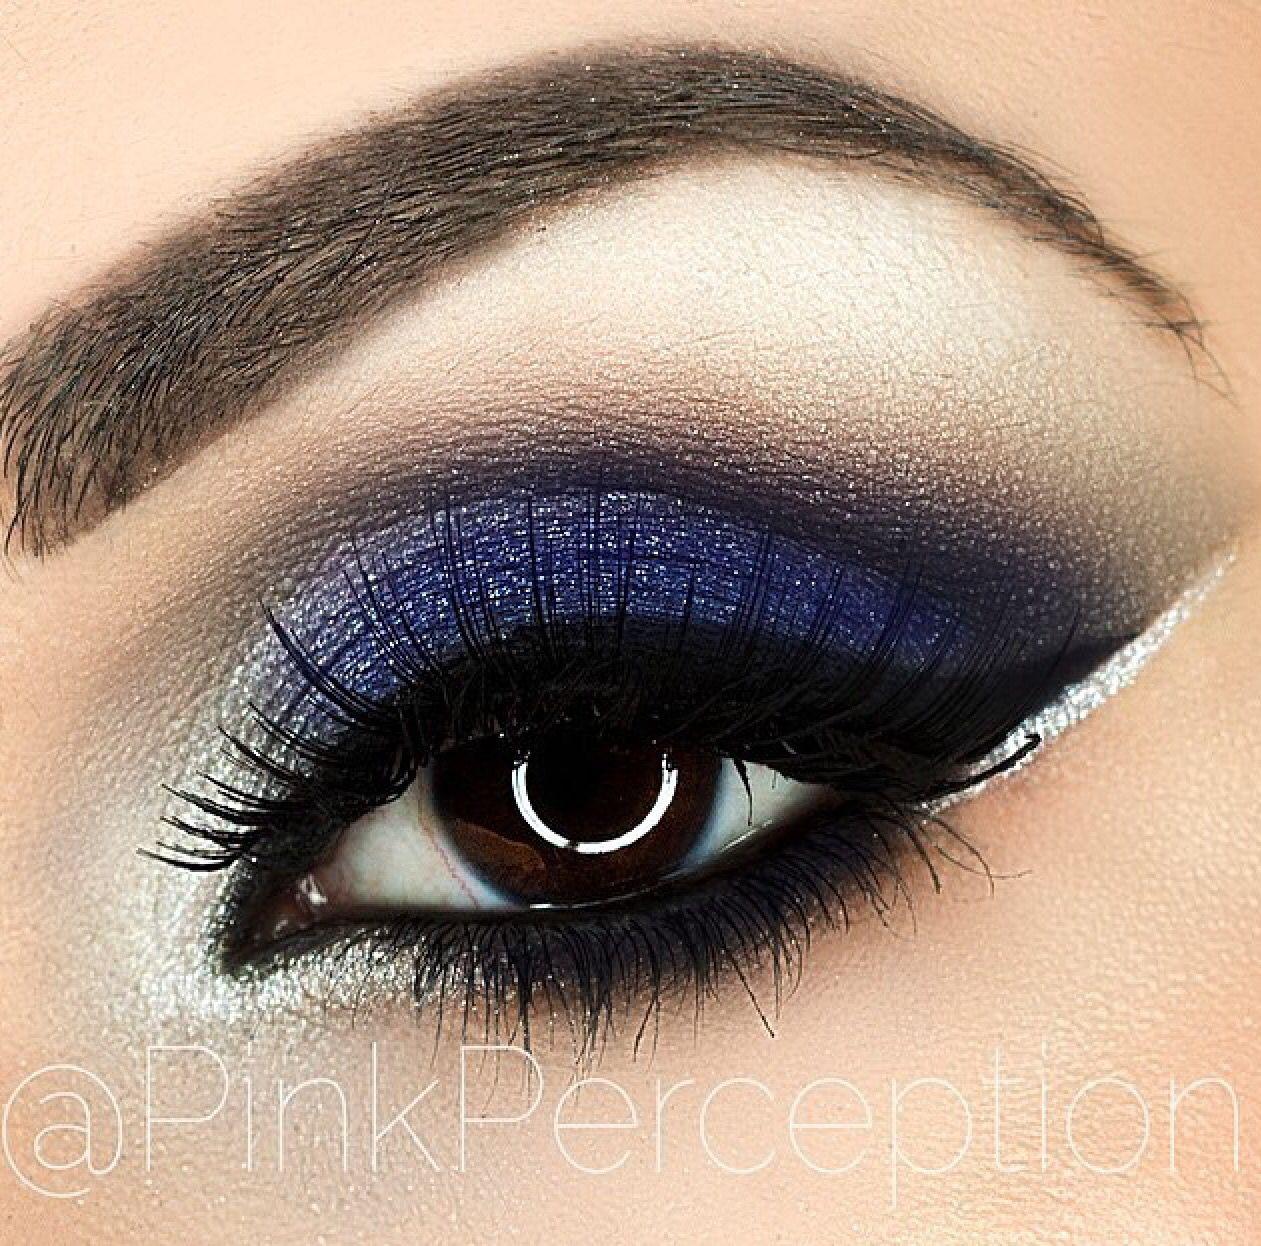 Noche Azul Maquillaje Ojos Azules Maquillaje En Tonos Azules Maquillaje De Ojos